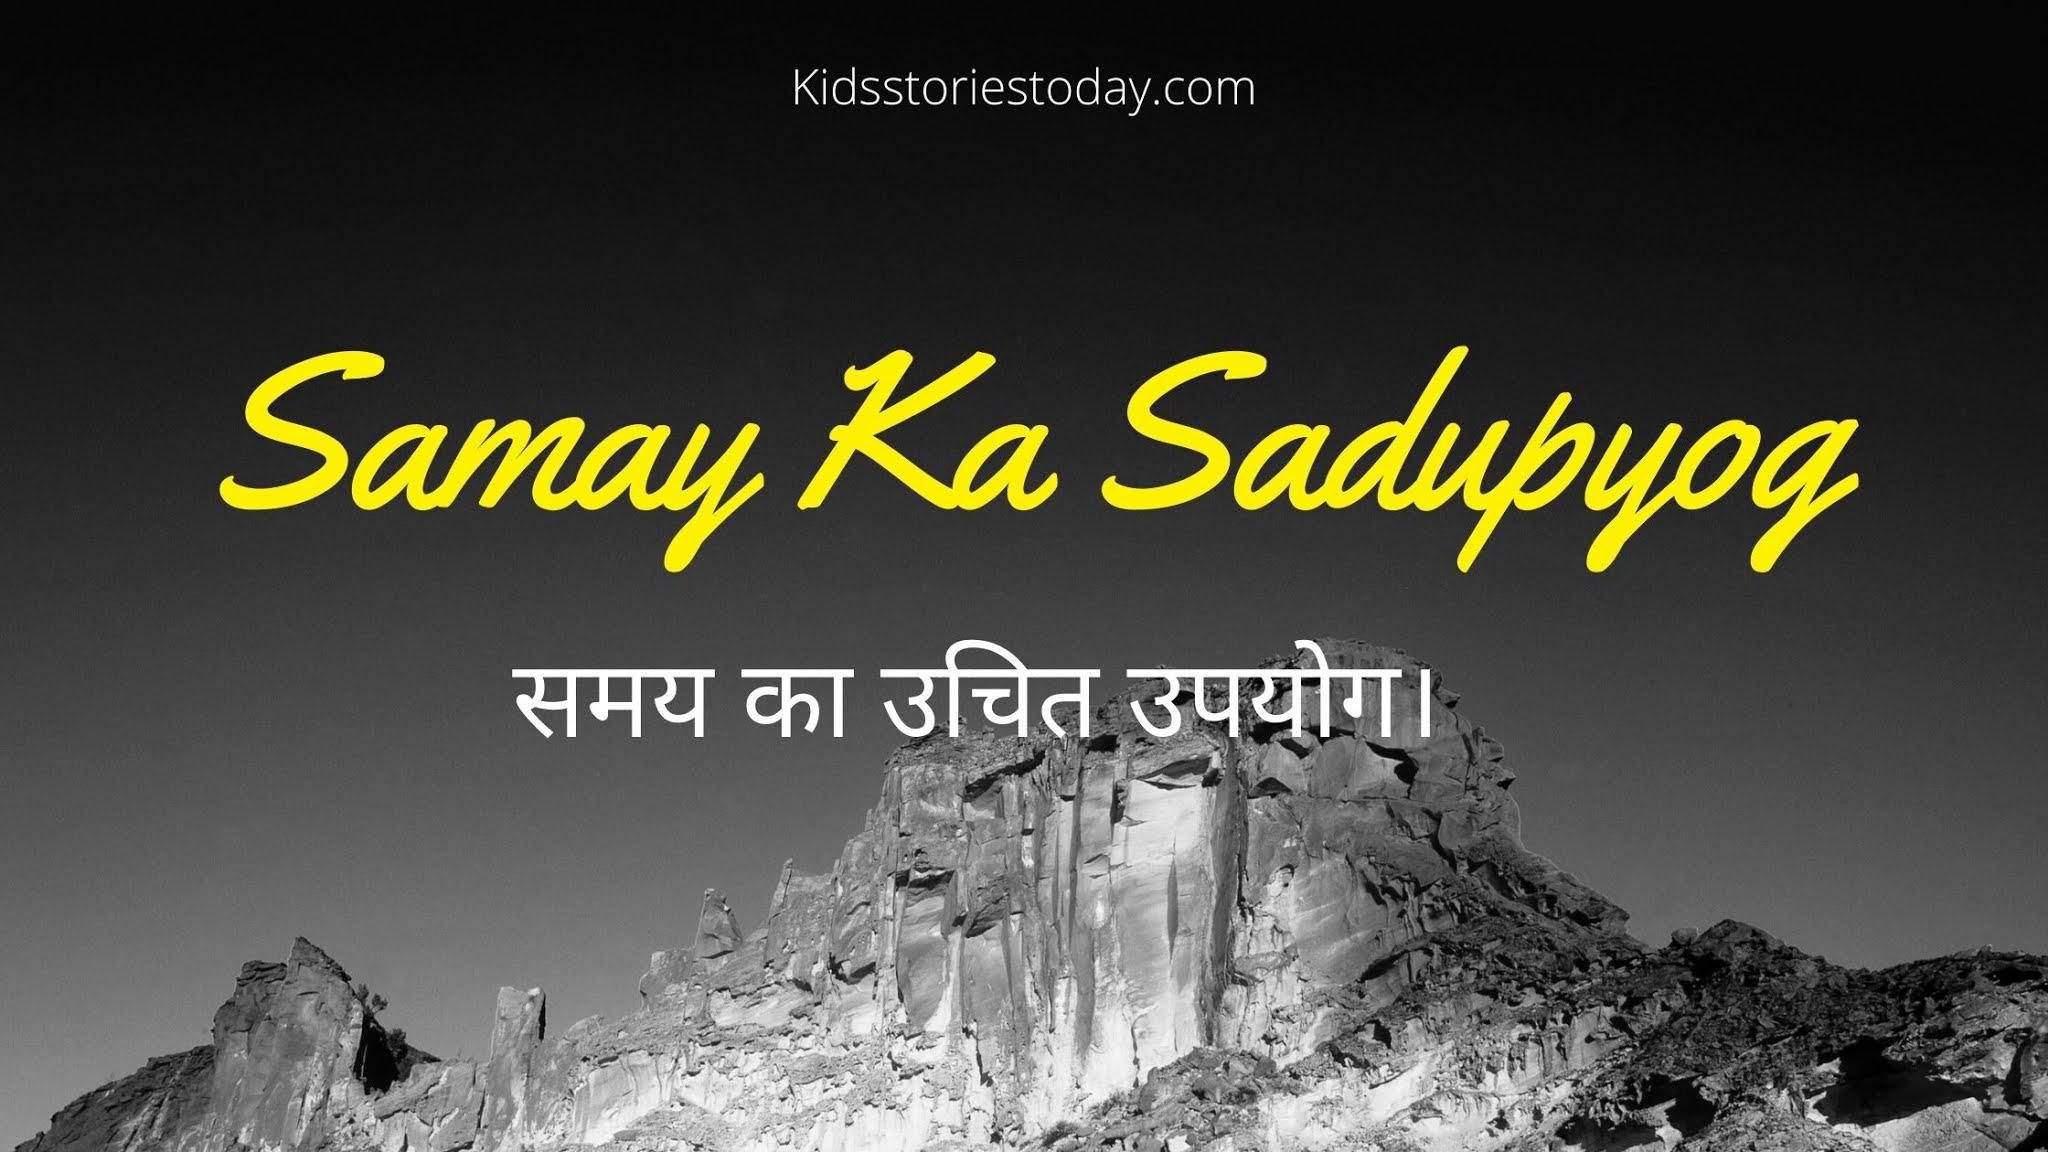 Samay Ka Sadupyog | समय का उचित उपयोग। Moral stories in hindi for kids